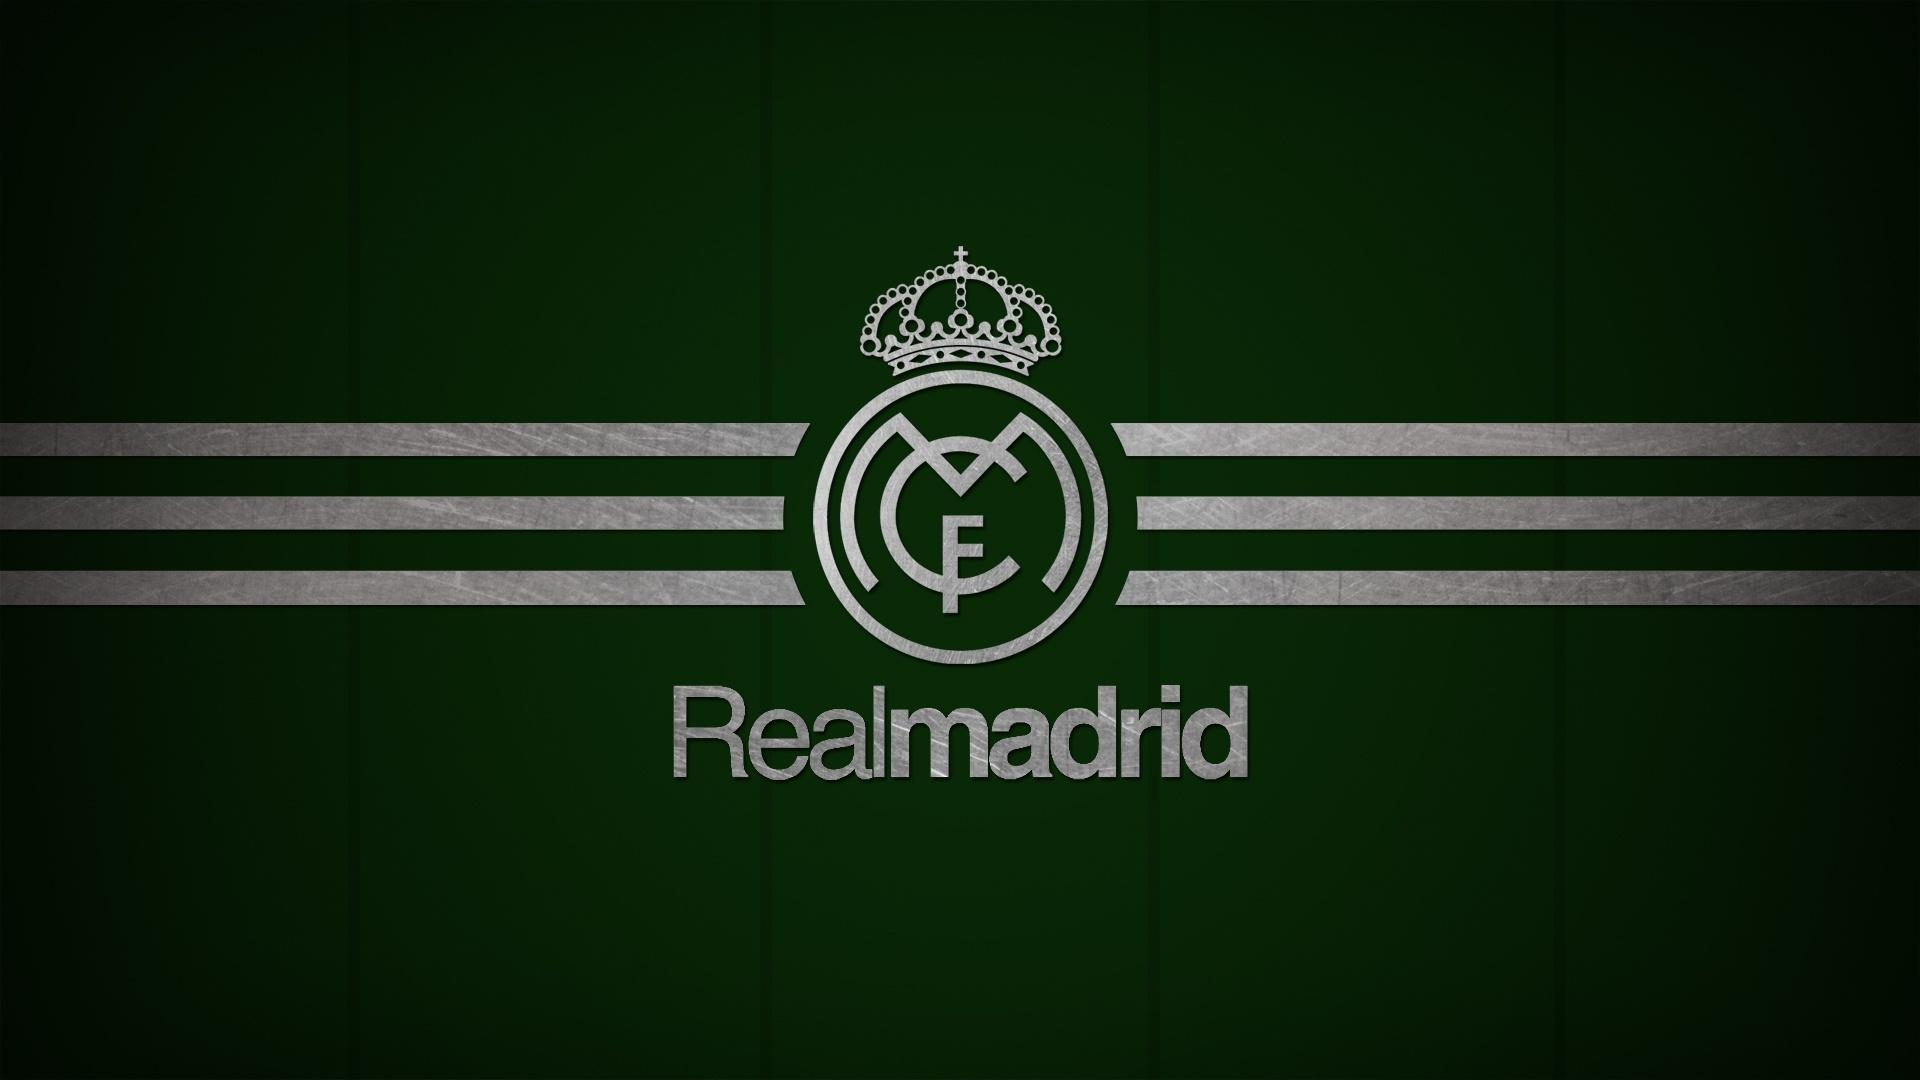 22 Real Madrid Logo Wallpaper Hd 2017 On Wallpapersafari